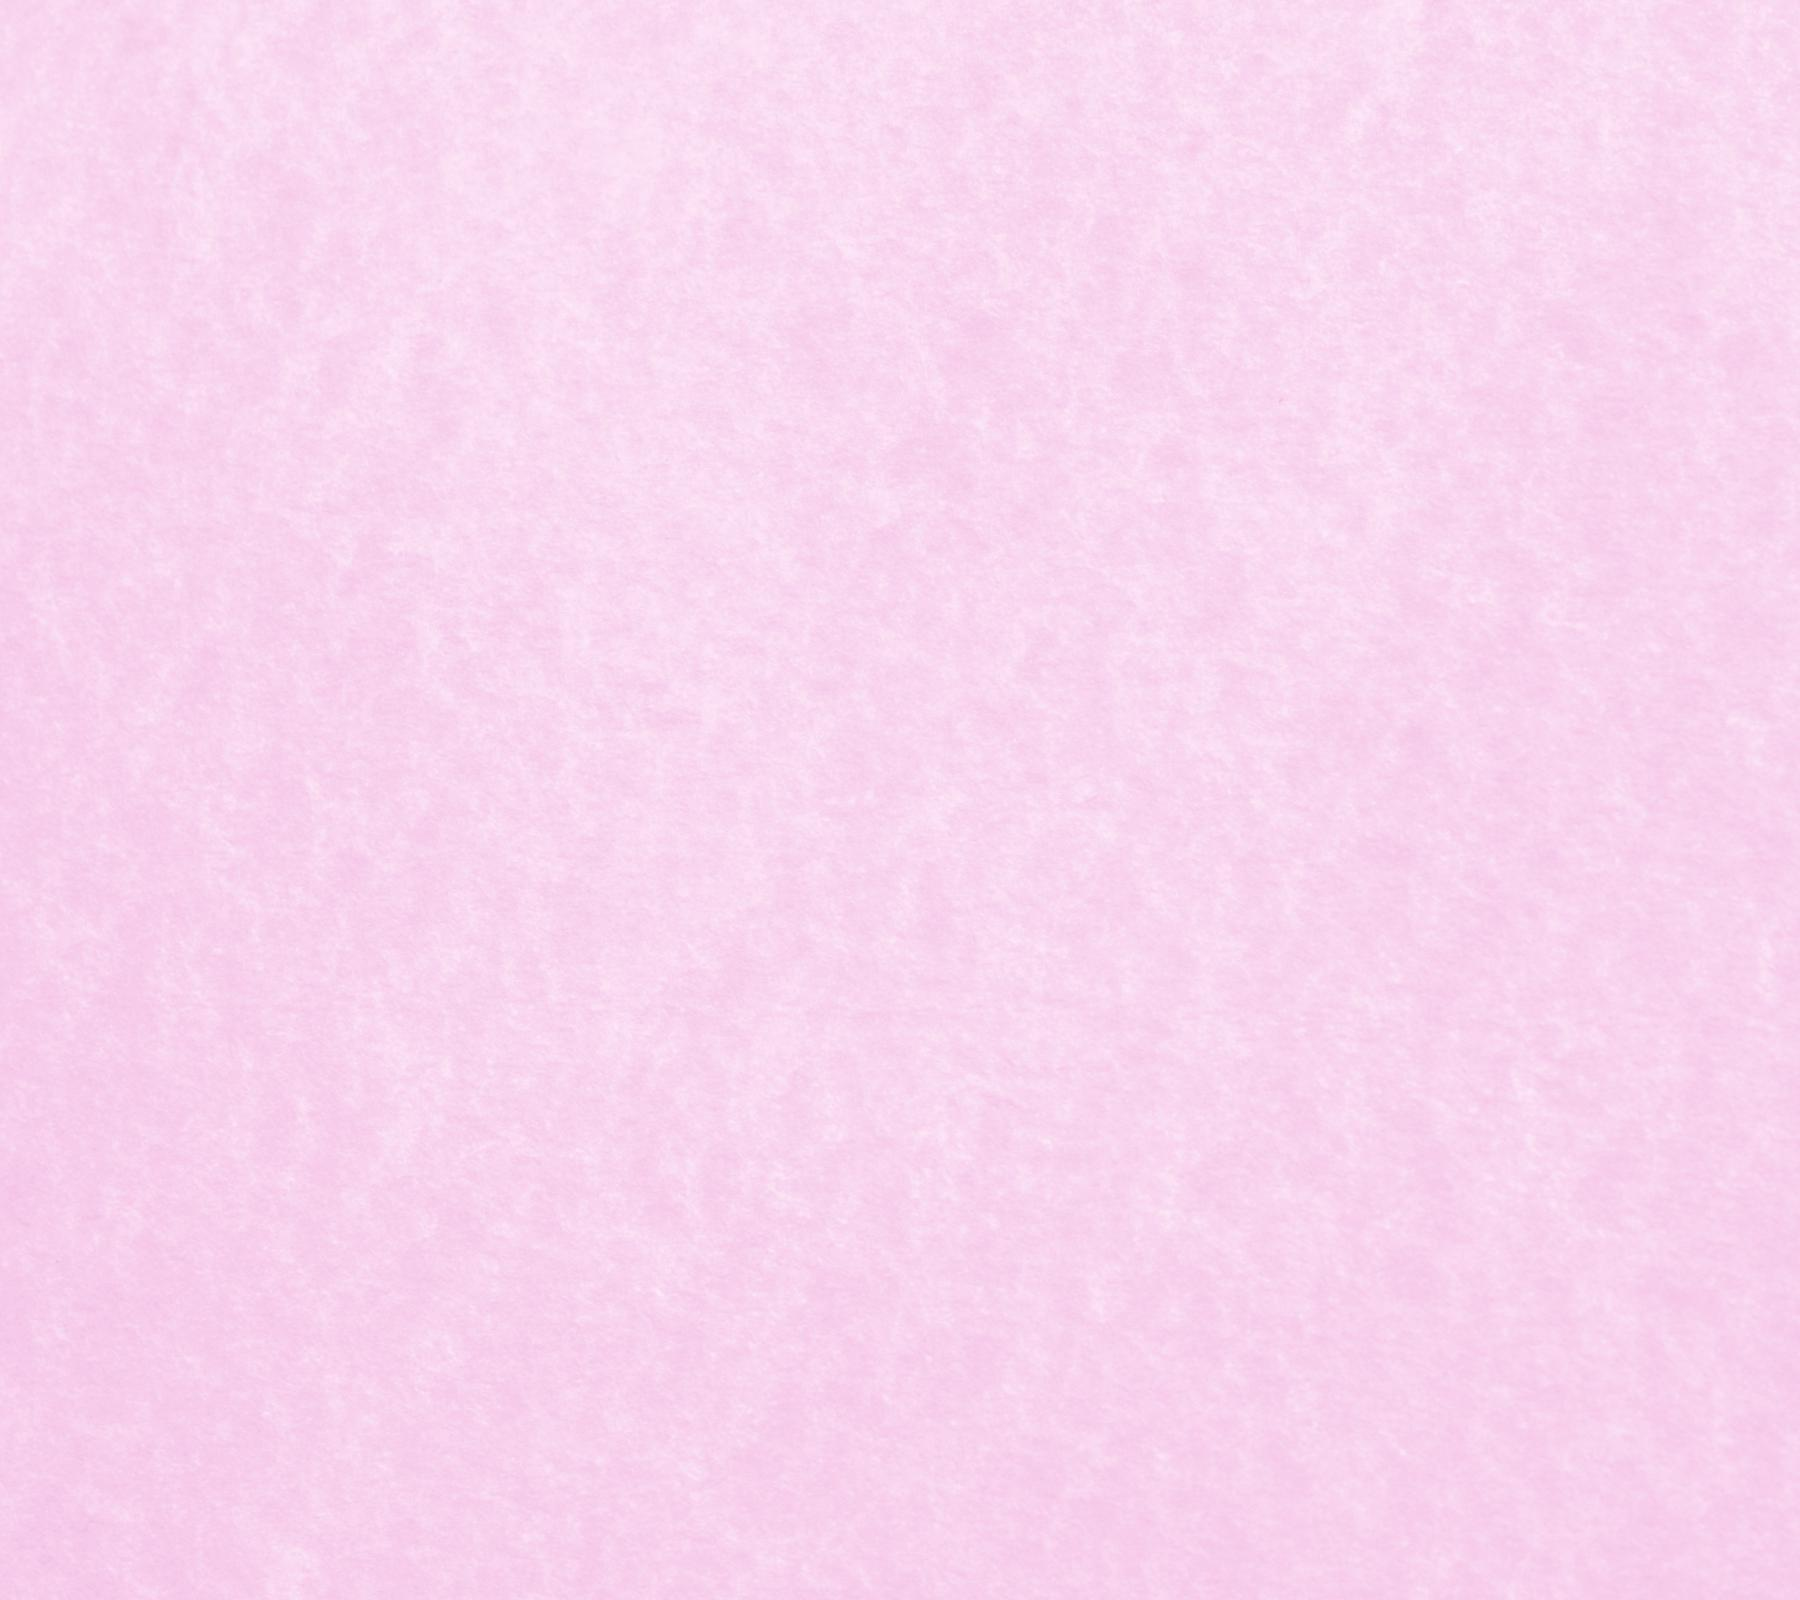 light pink backgrounds wallpaper cave